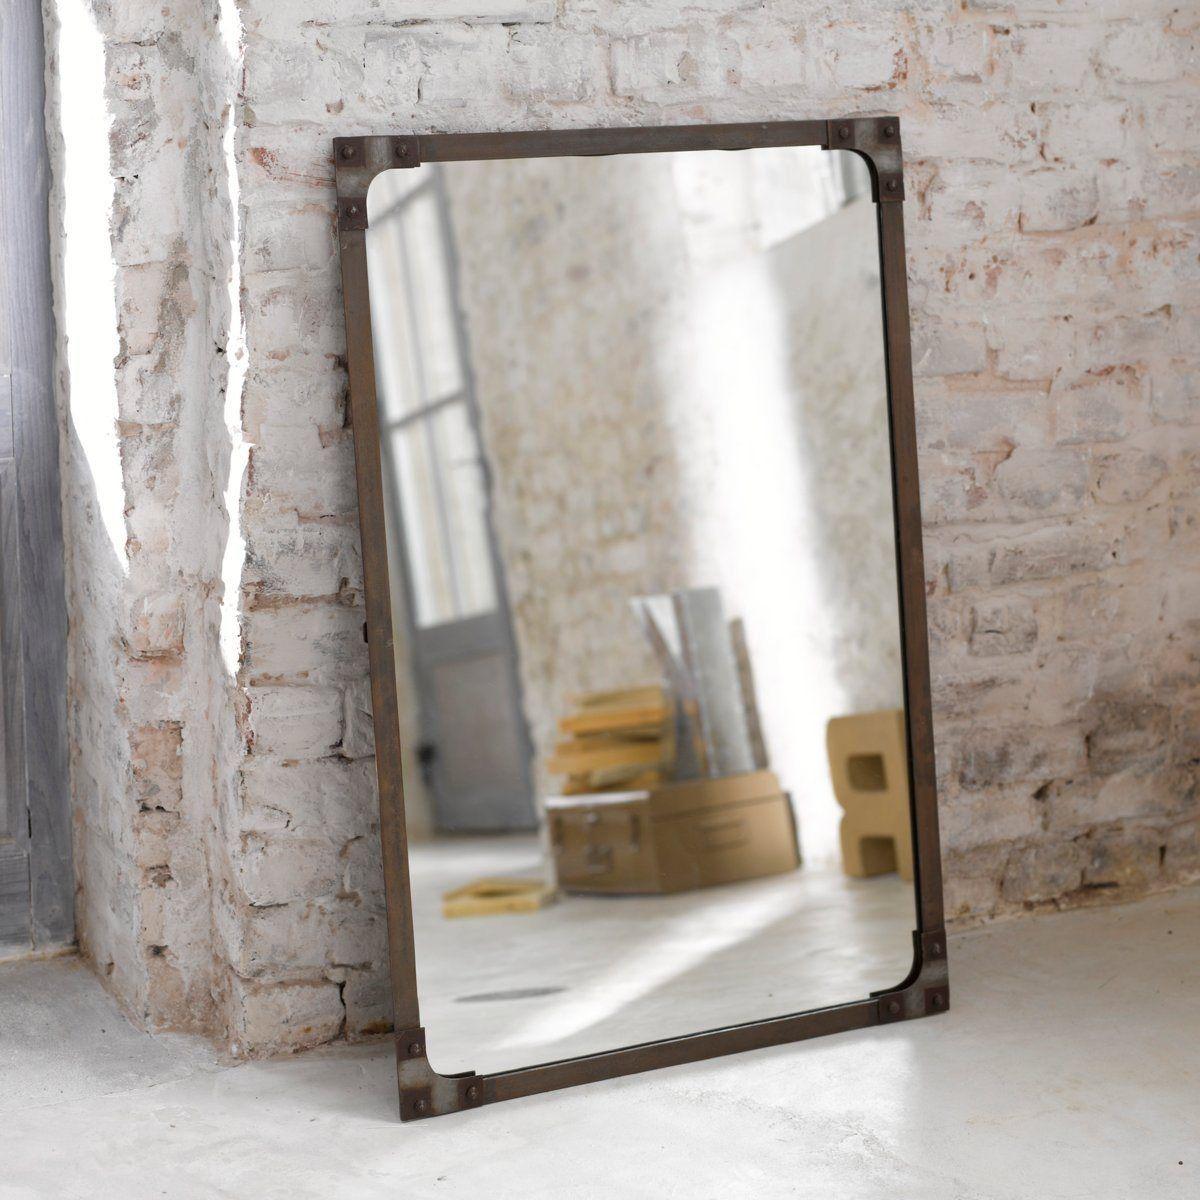 Industrial Le espelho estilo industrial lenaig la redoute interieurs la